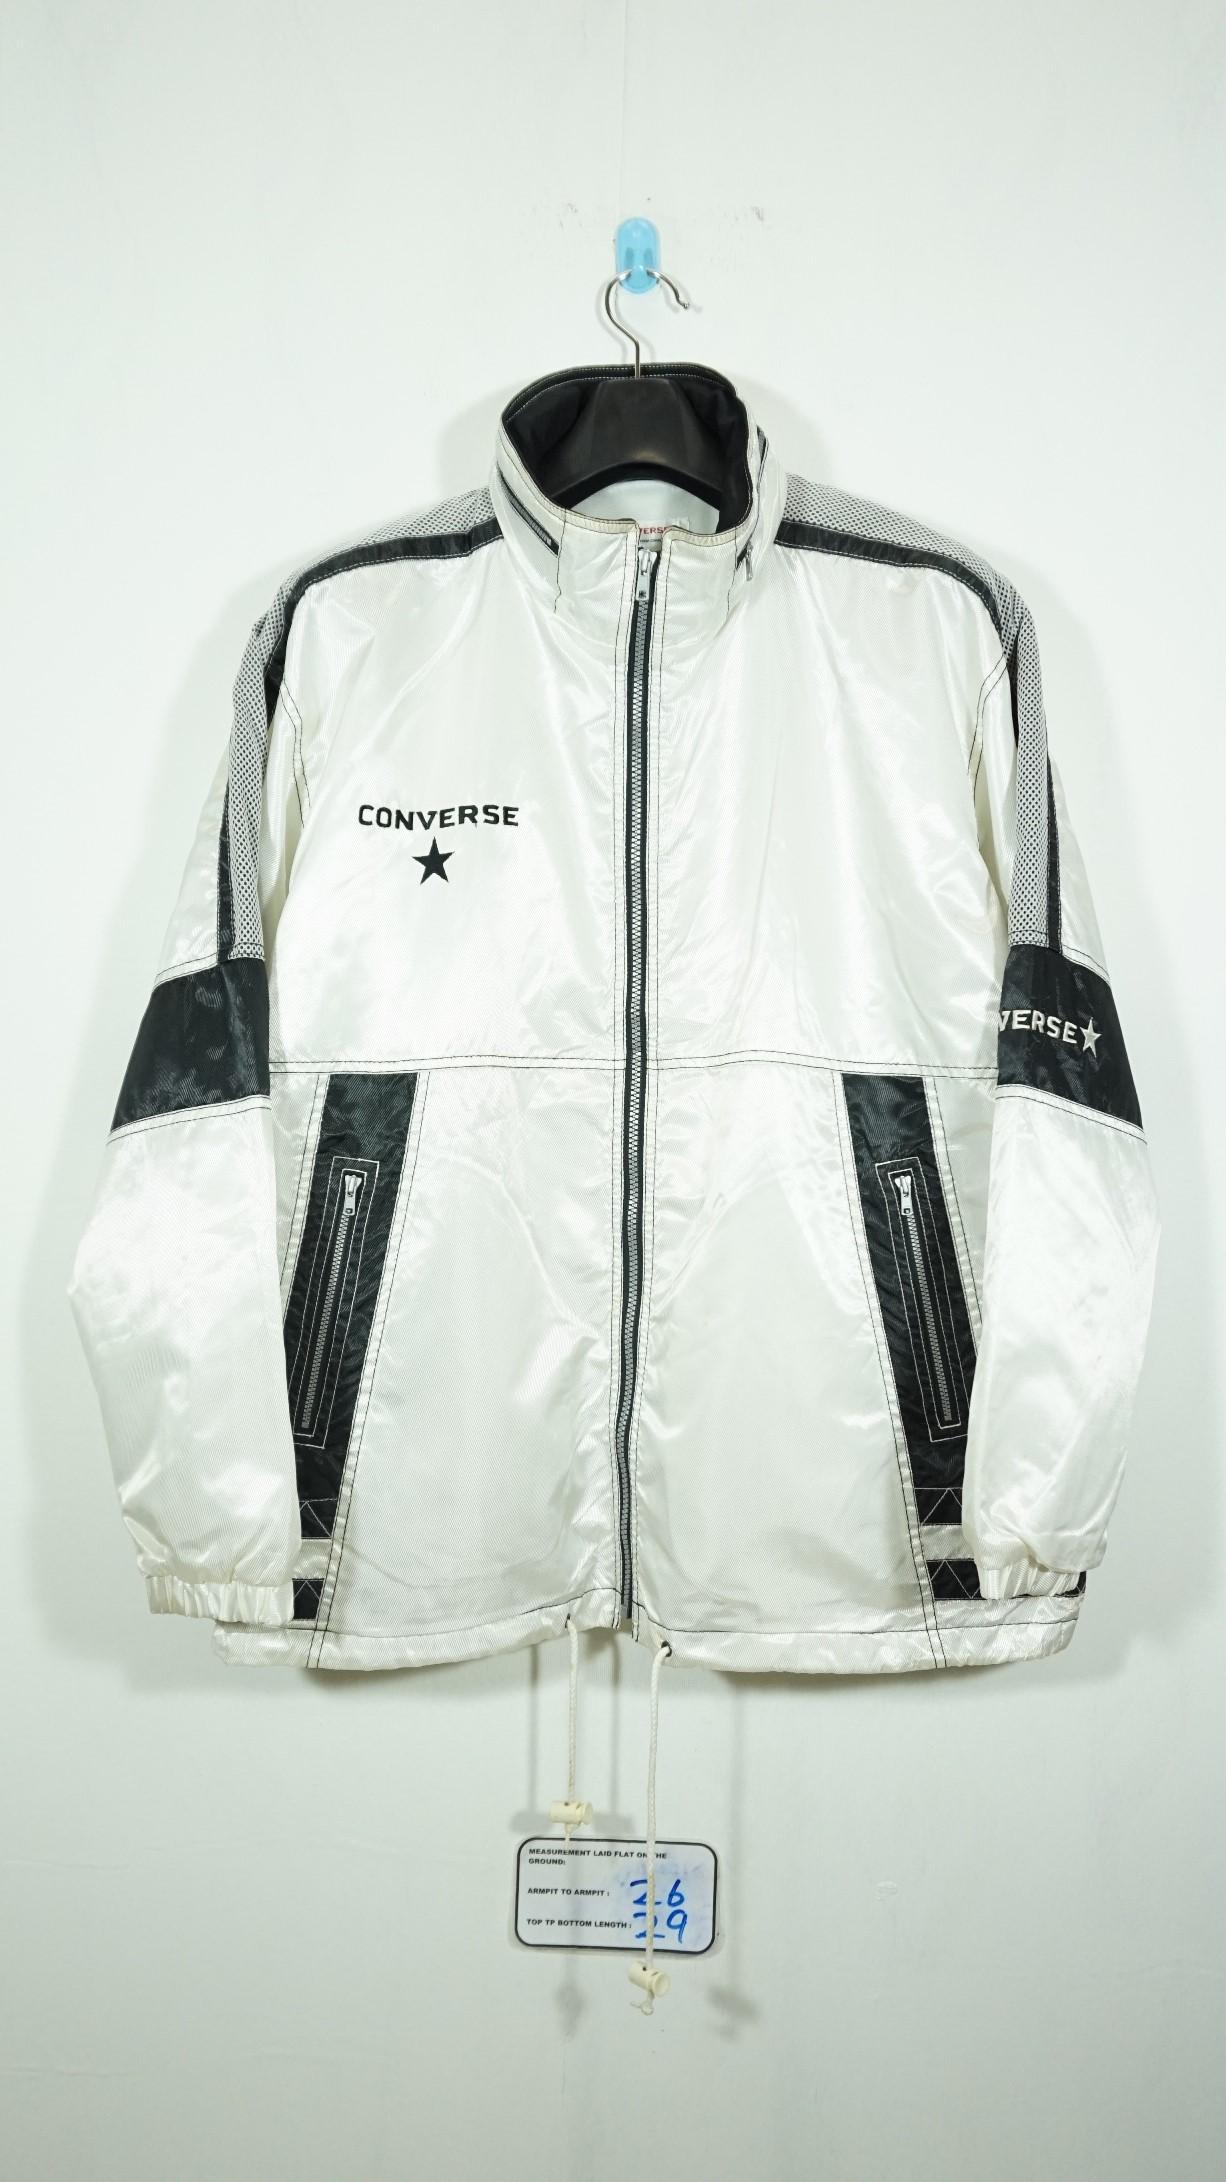 d0bd67cebbdd Vintage × Converse. Vintage Converse Jaspo One Star Hooded Windbreaker  Jacket Size Large